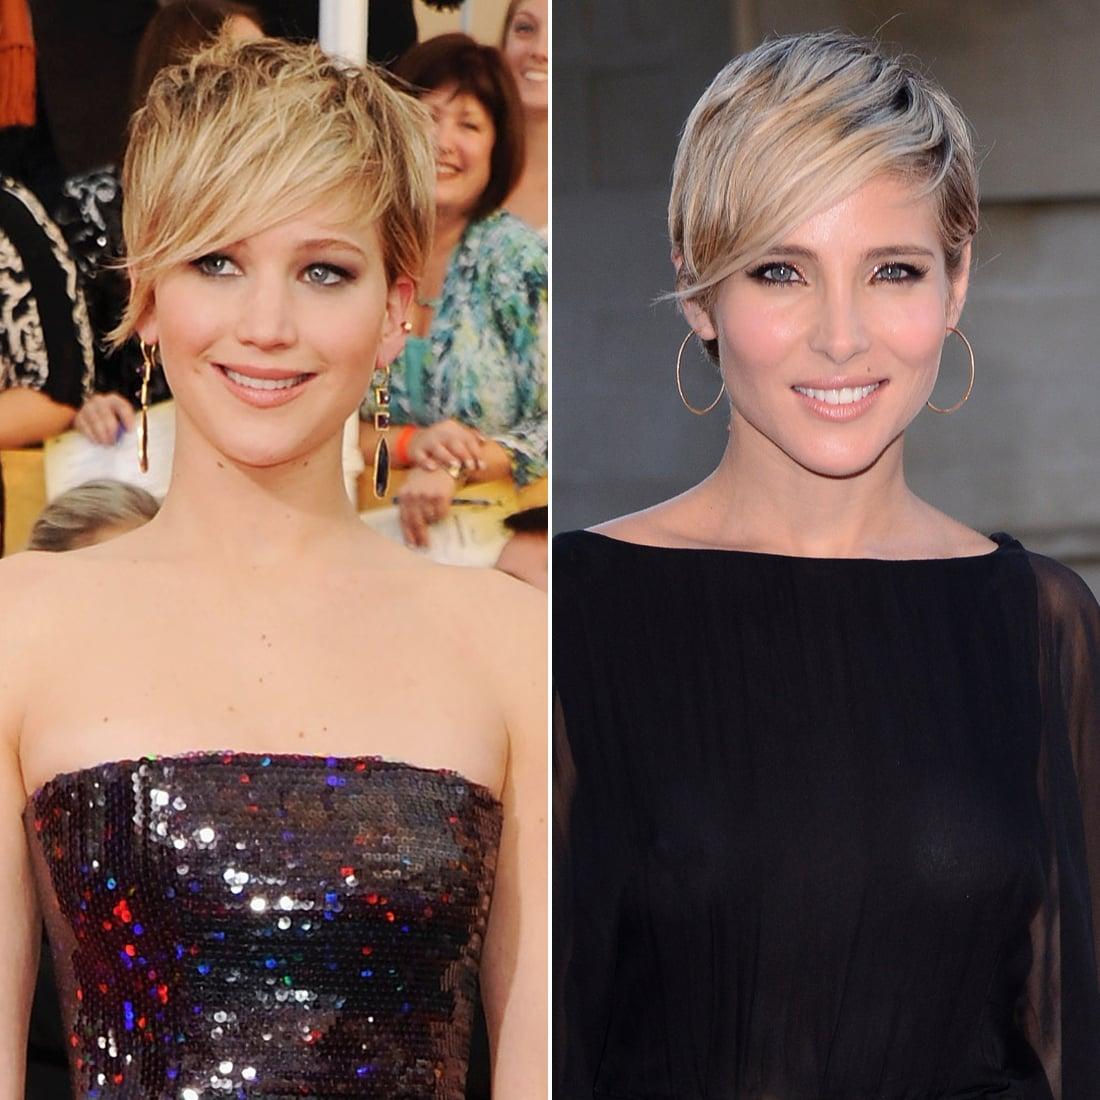 Jennifer Lawrence and Elsa Pataky